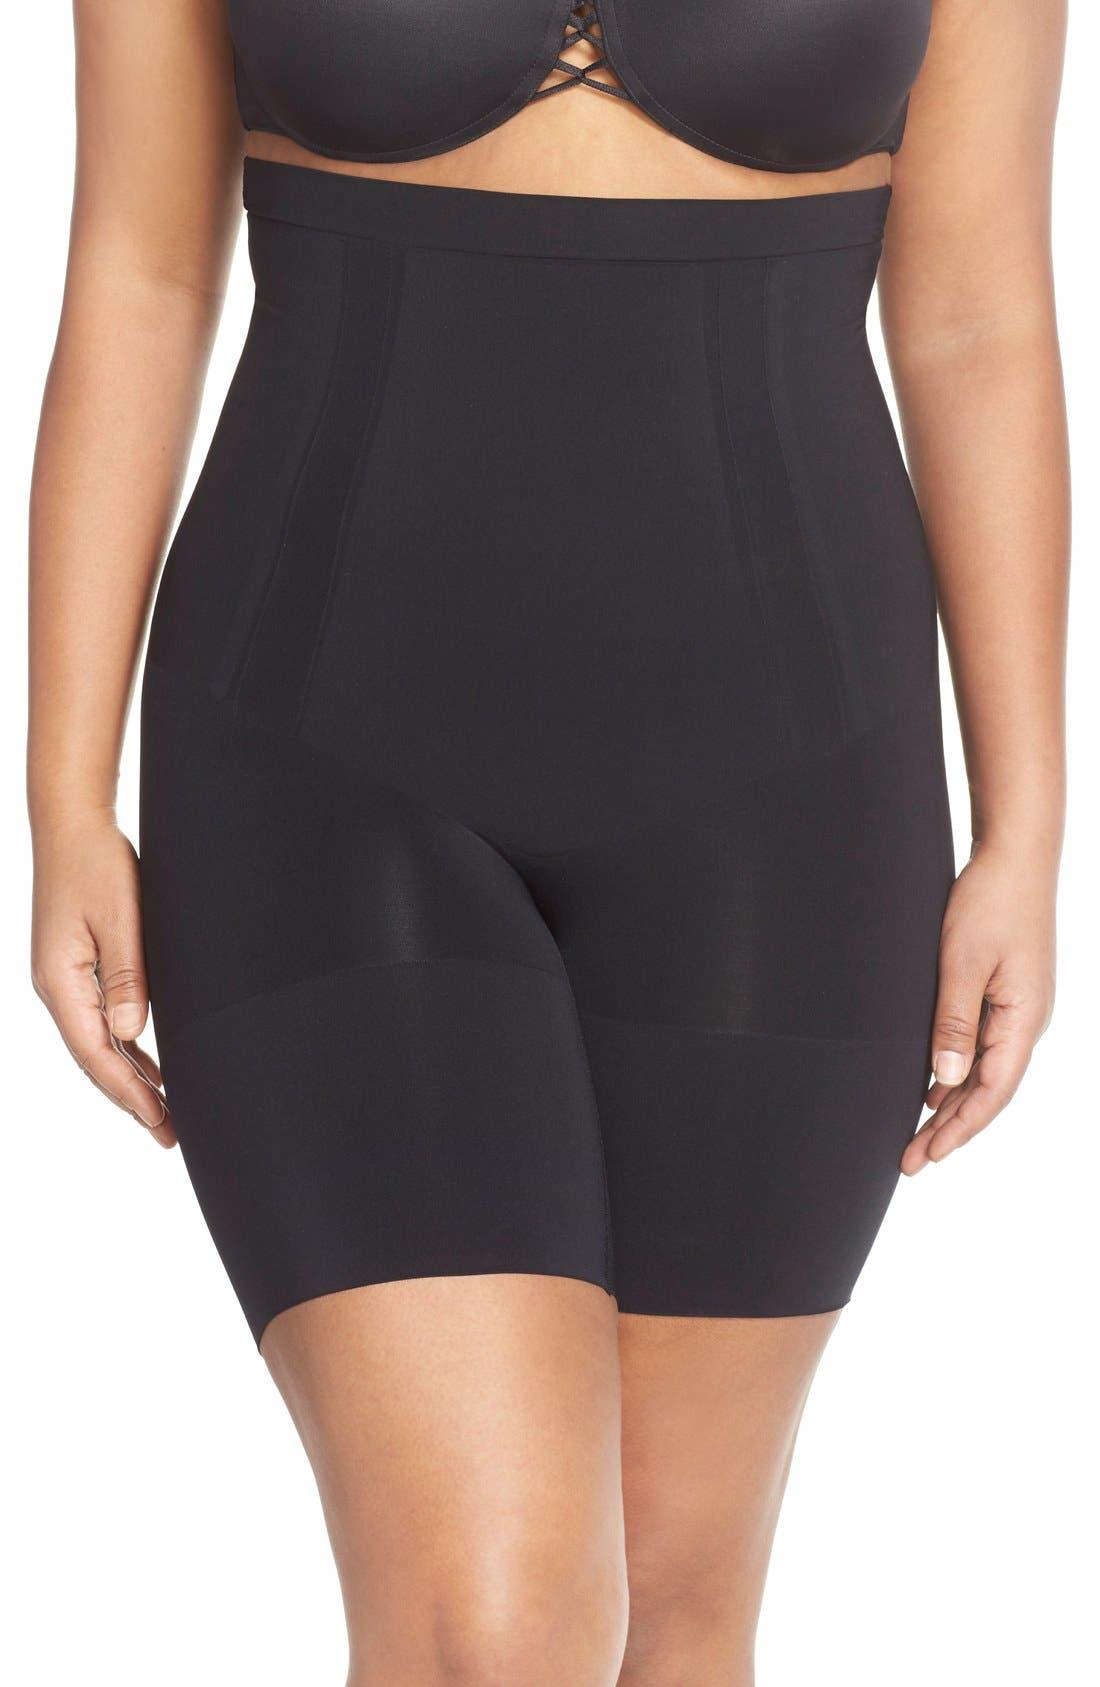 OnCore High Waist Mid-Thigh Shorts,                             Main thumbnail 1, color,                             VERY BLACK